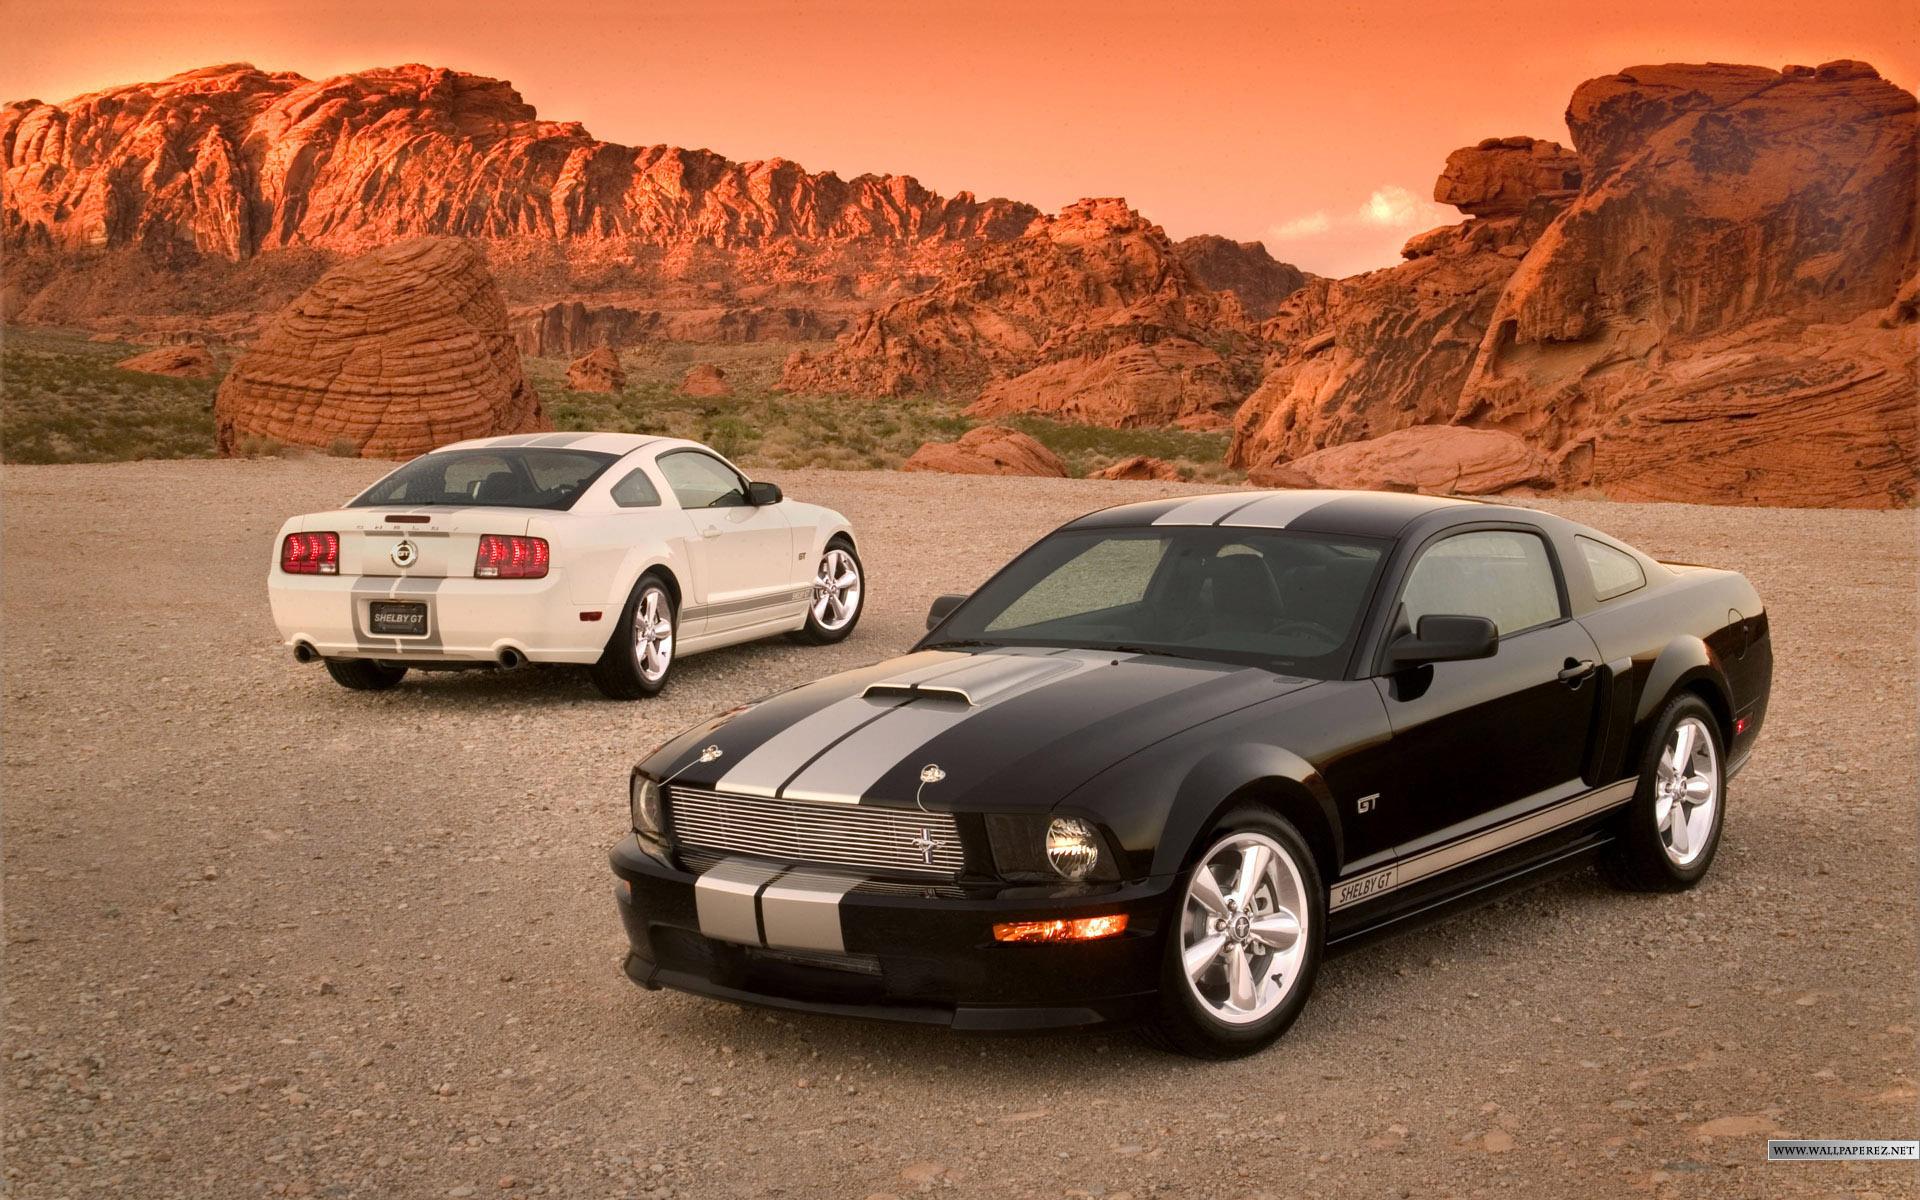 Mustang DUB Edition